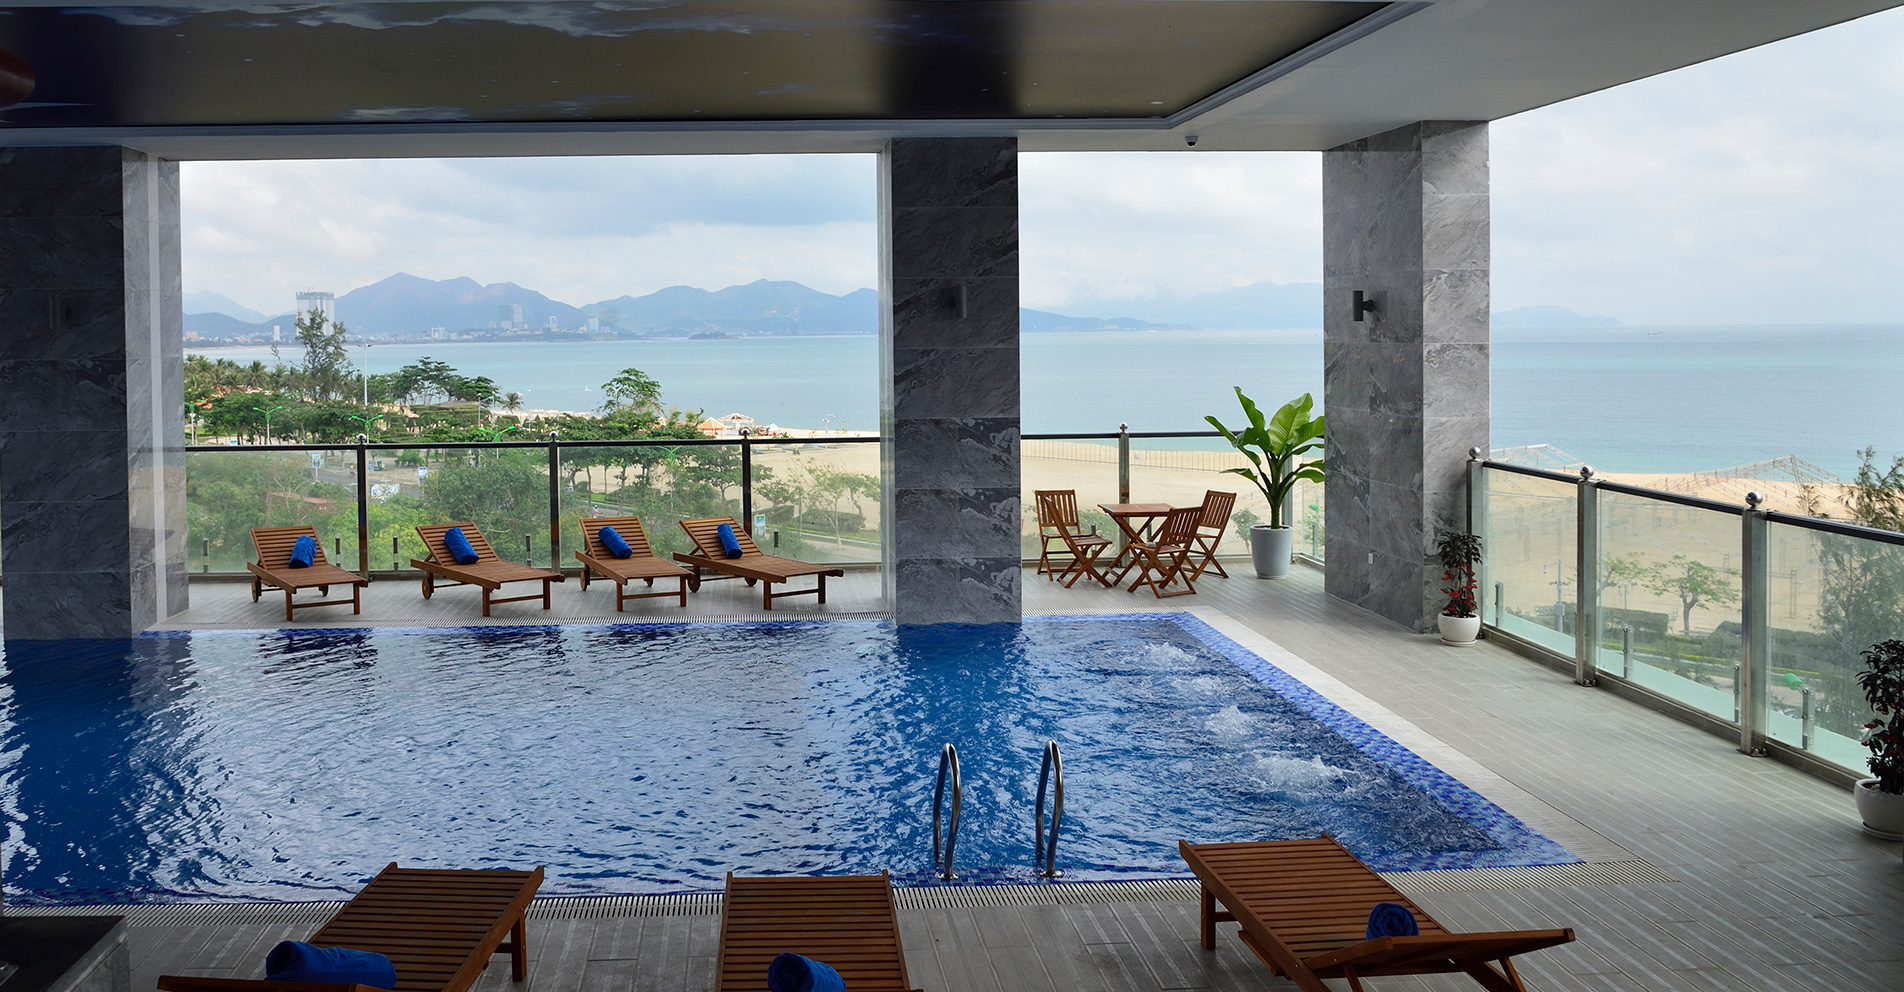 http://xaviahotel.com/vnt_upload/weblink/xavia_nhatrang_swimming_pool_banner-home.jpg